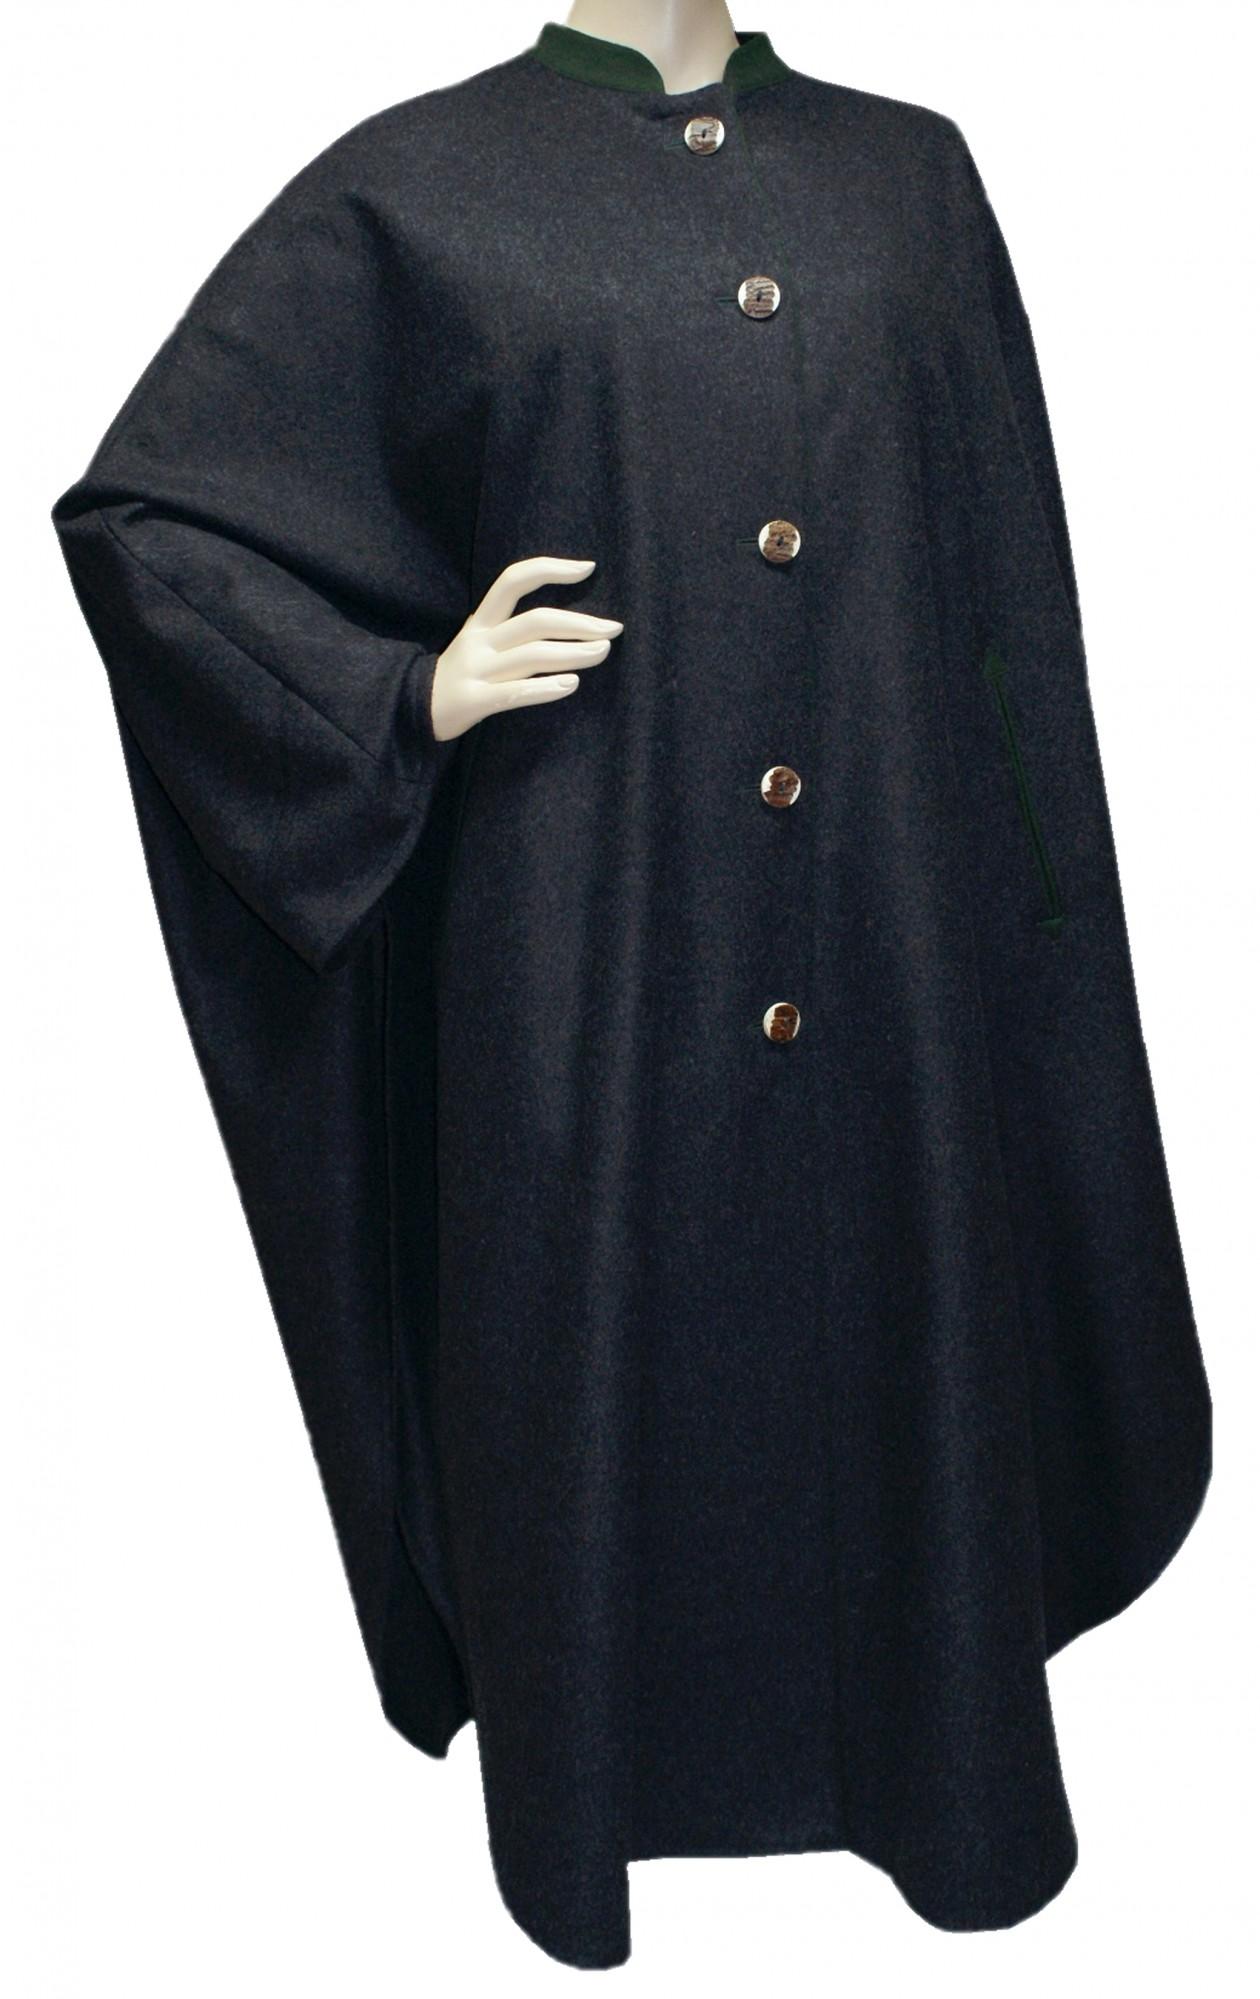 s xl damen wetterfleck grau loden umhang cape poncho. Black Bedroom Furniture Sets. Home Design Ideas